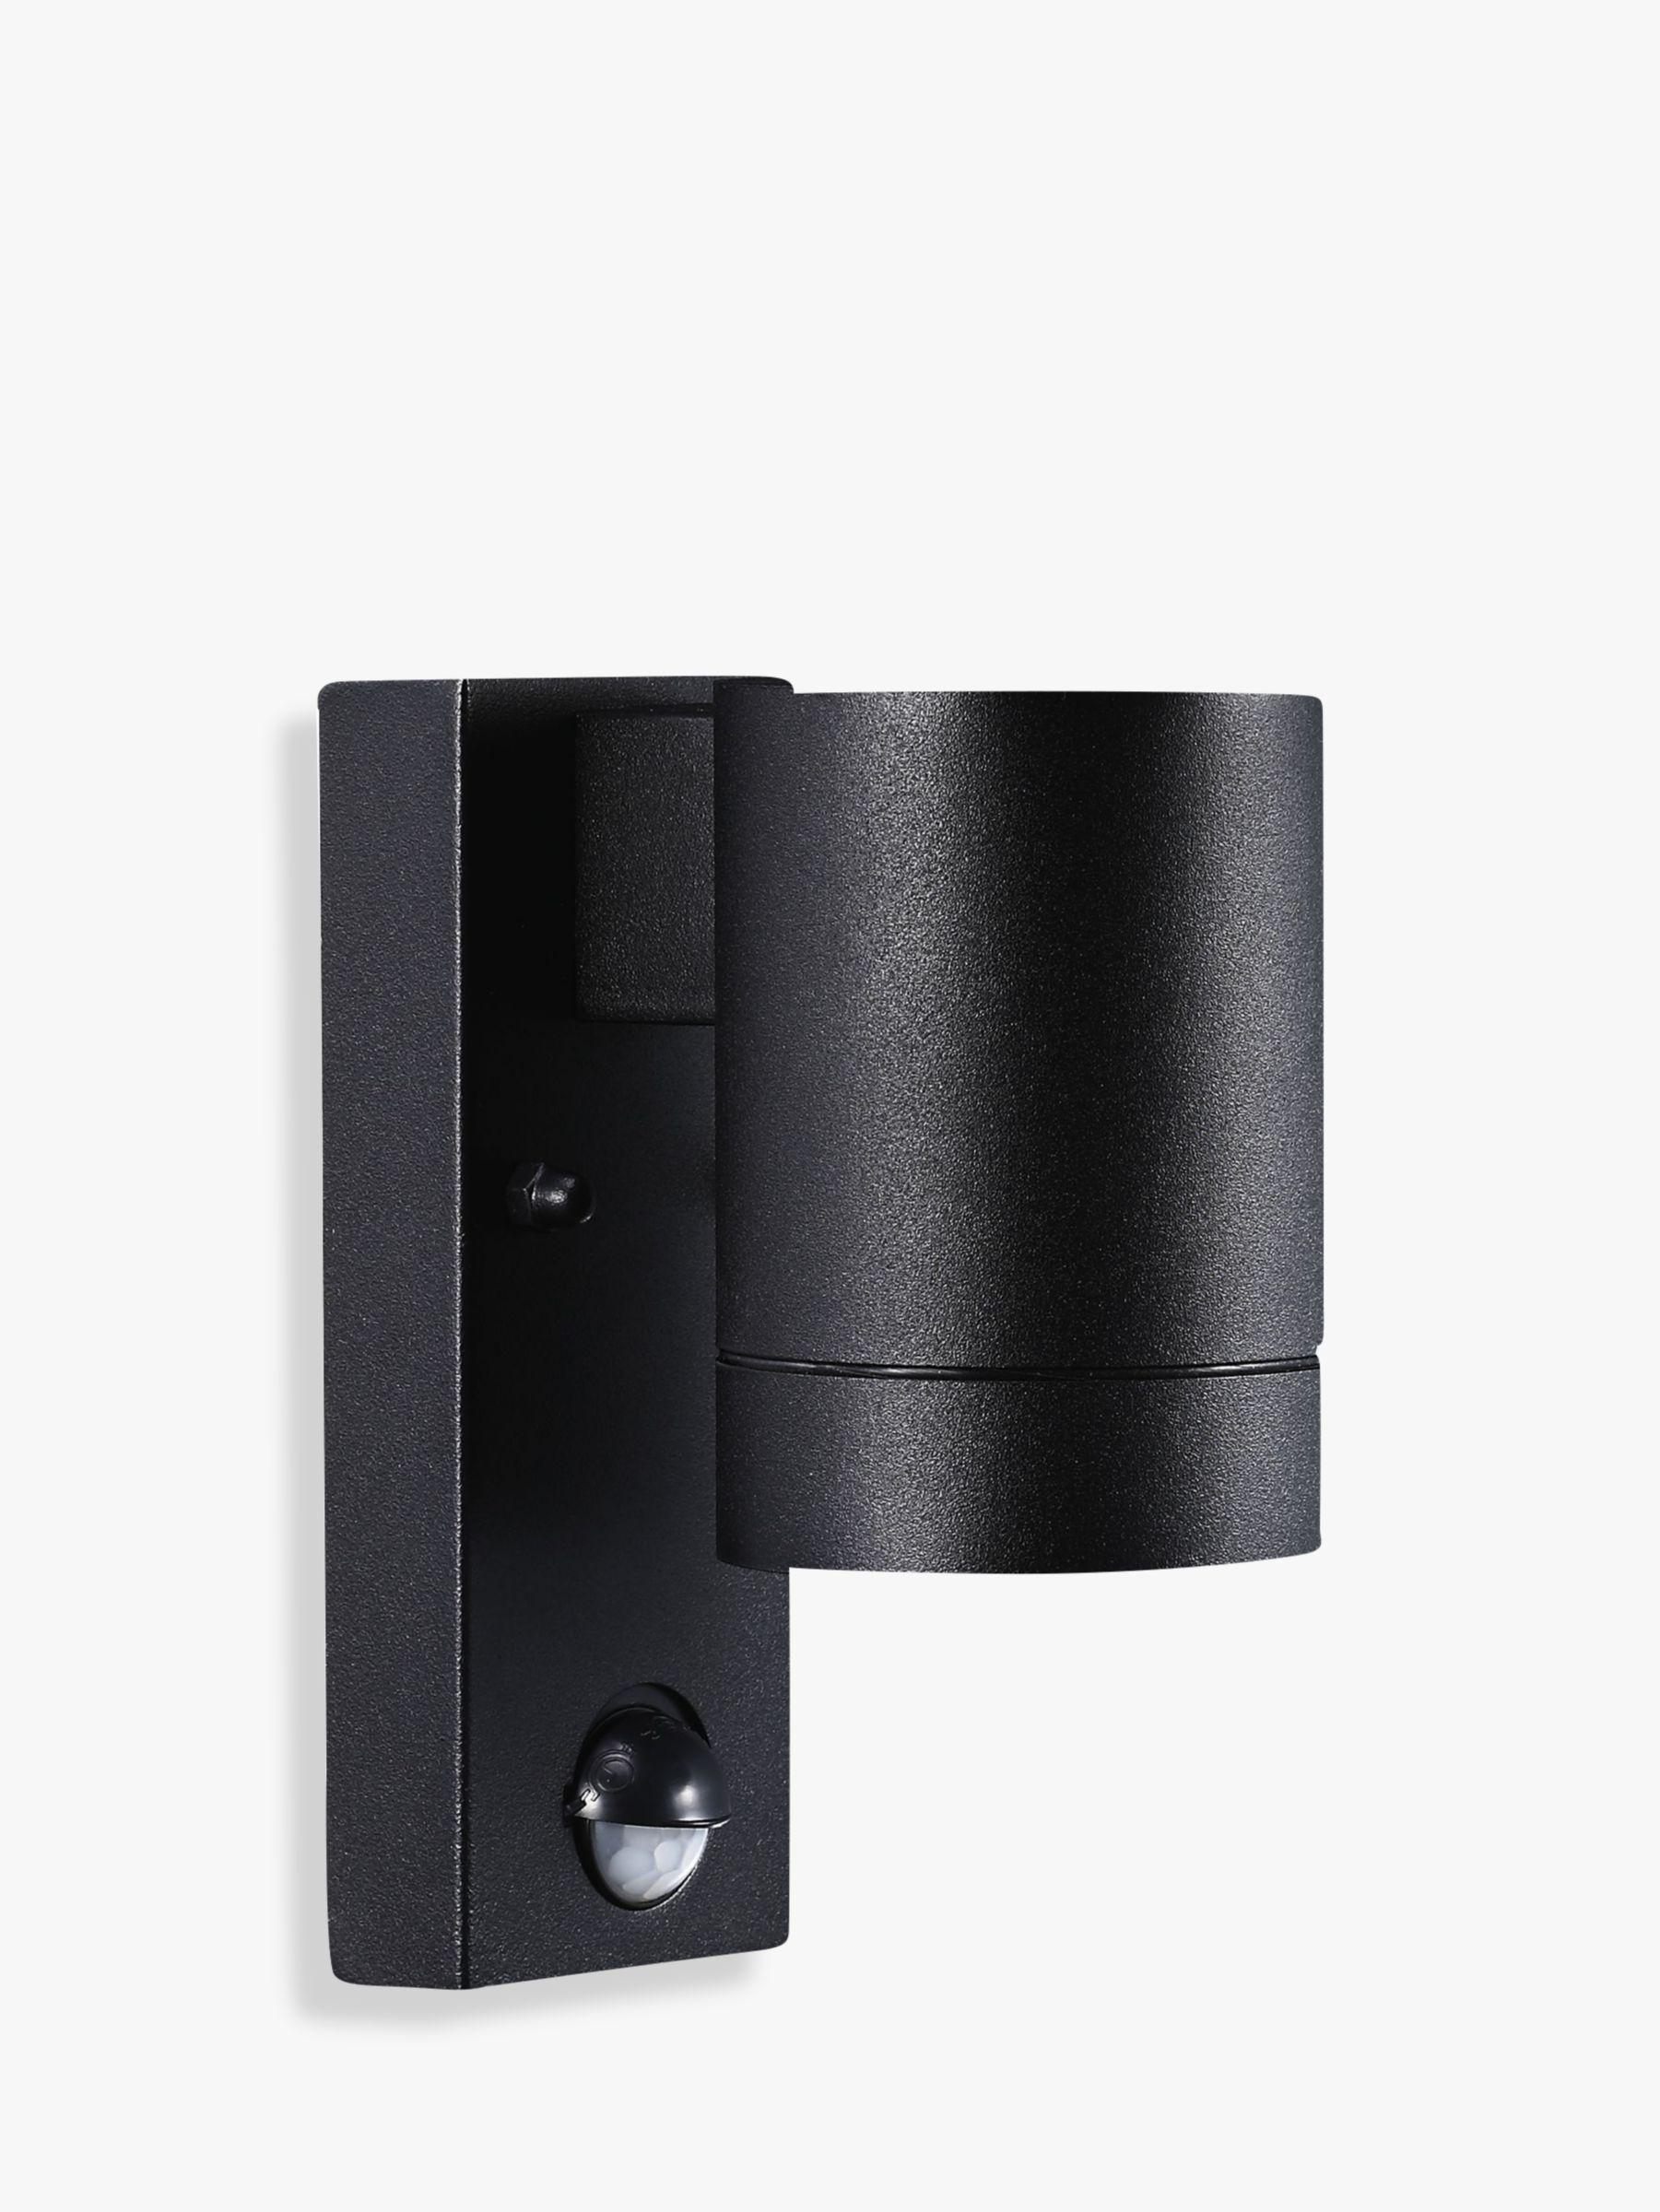 Nordlux Nordlux Tin Maxi PIR Outdoor Sensor Wall Light, Black